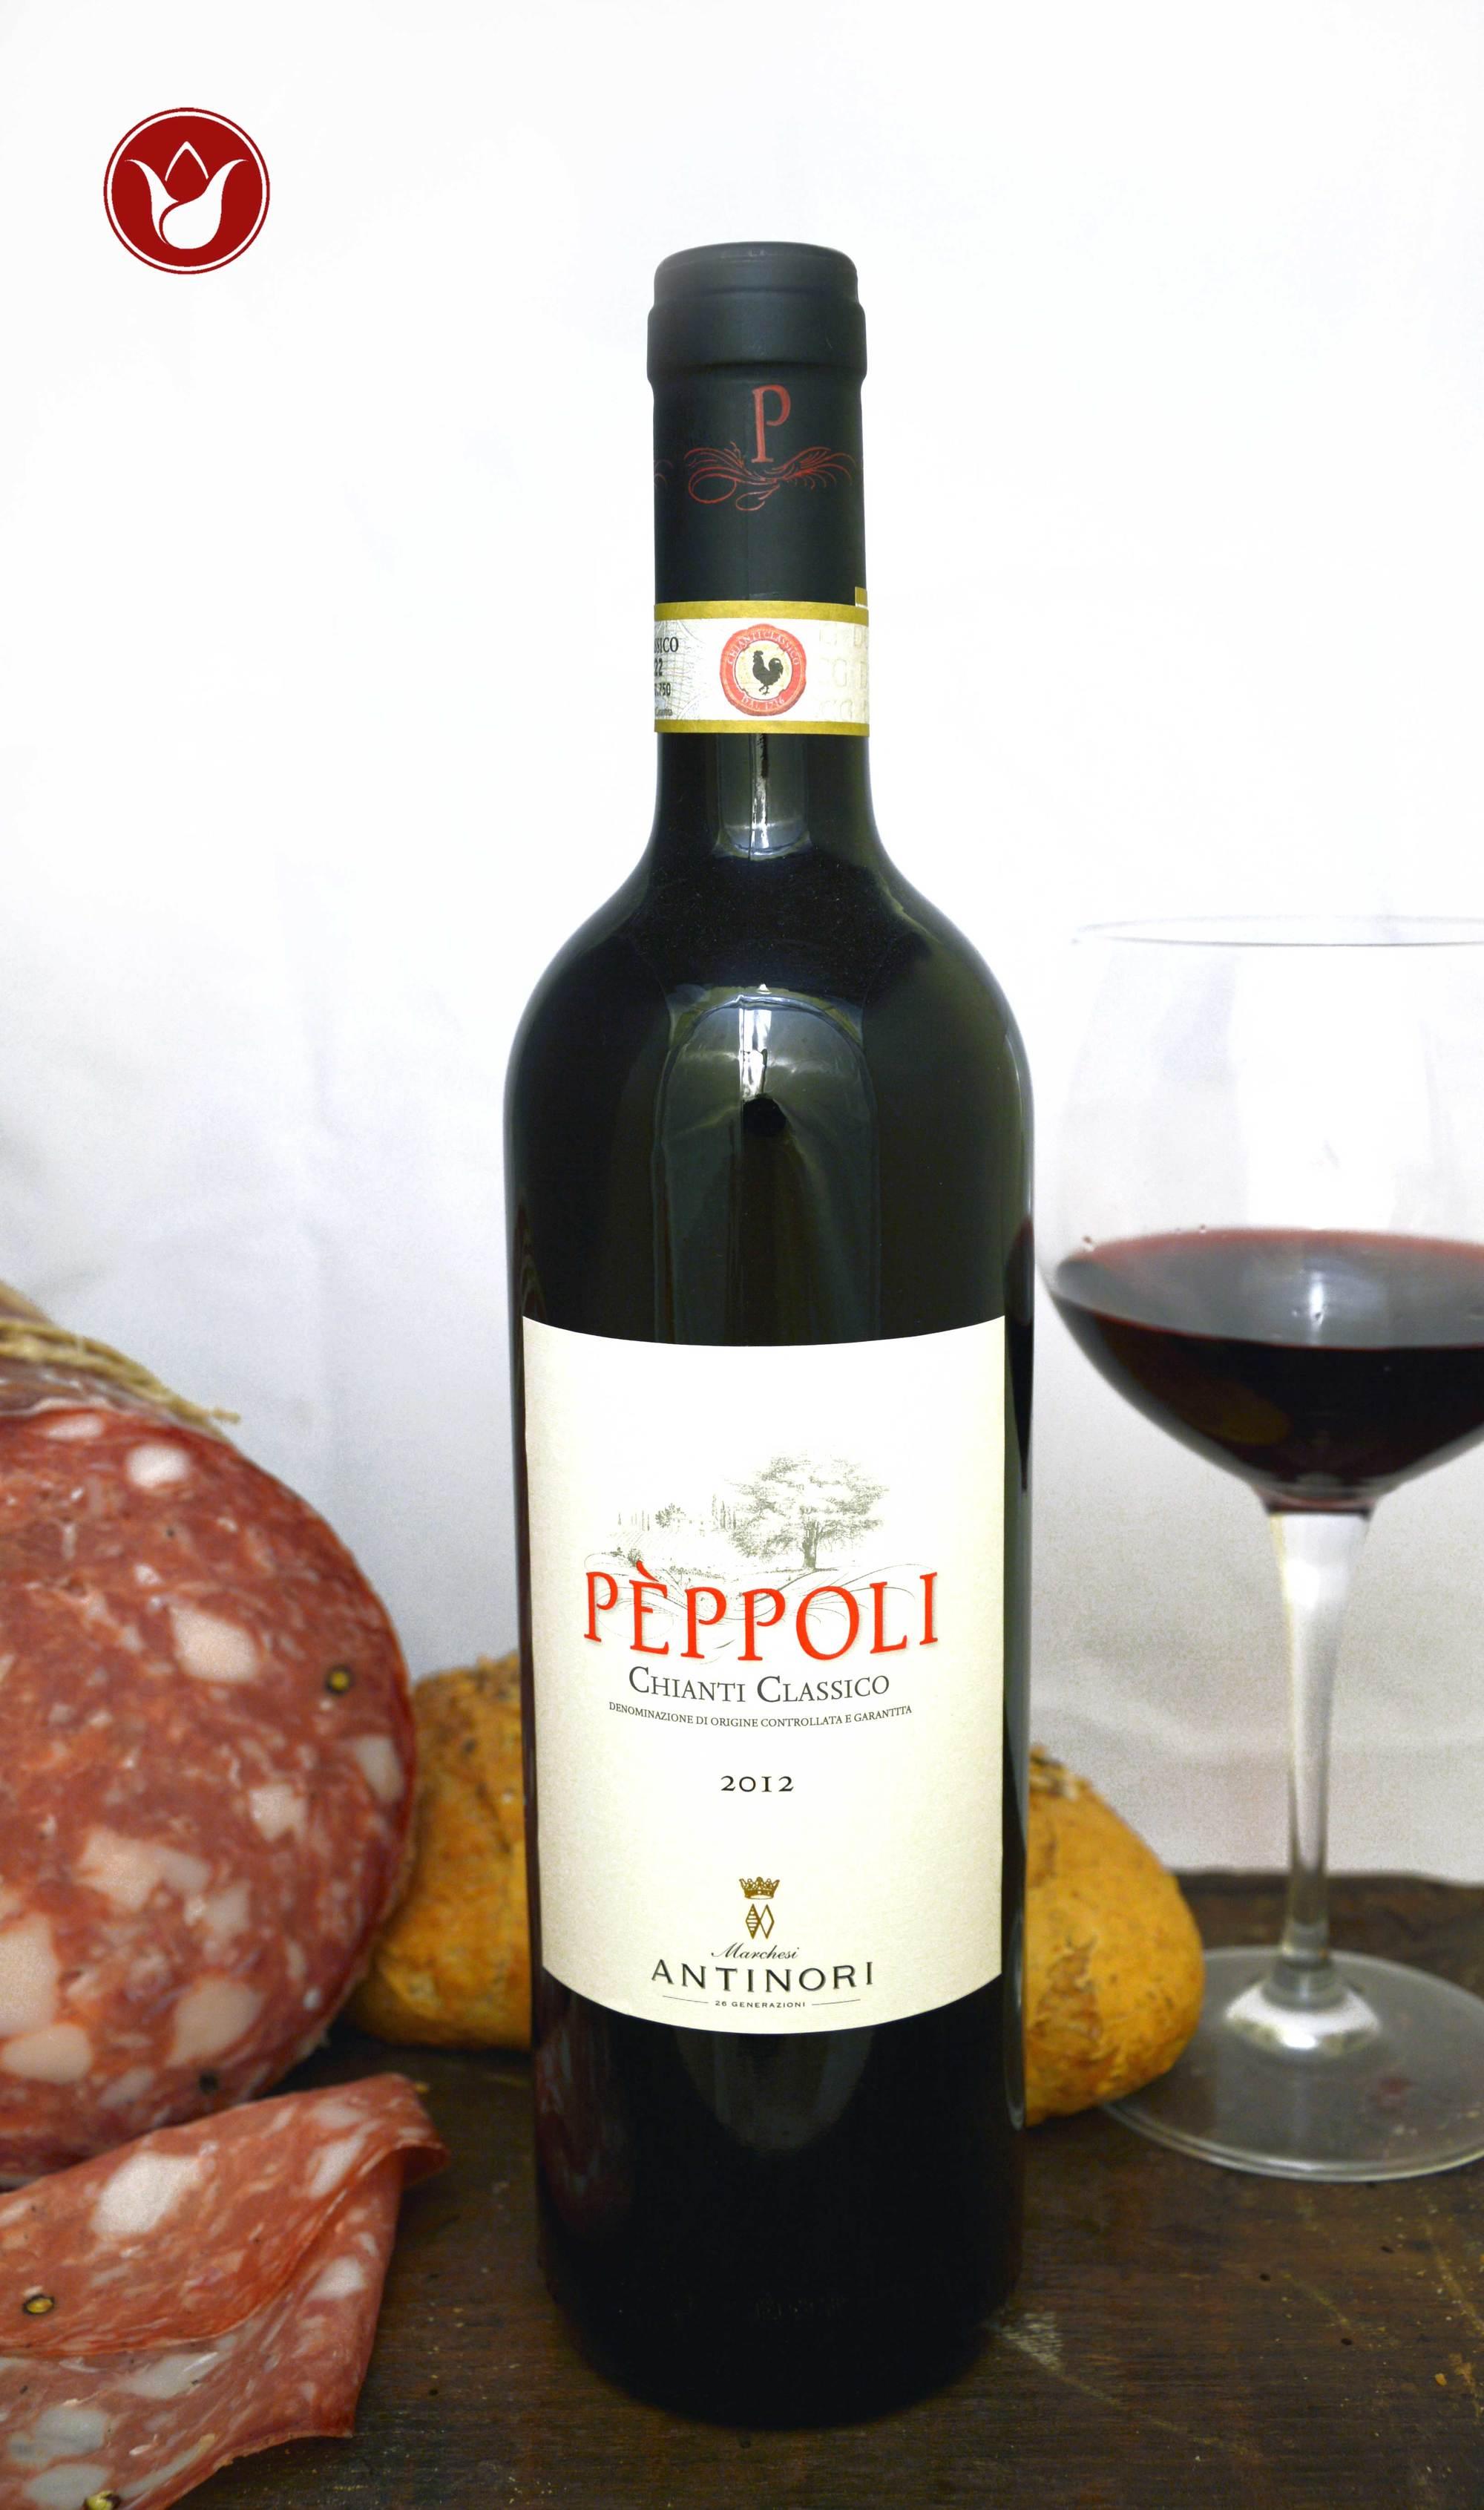 Peppoli-Chianti-Classico-Antinori